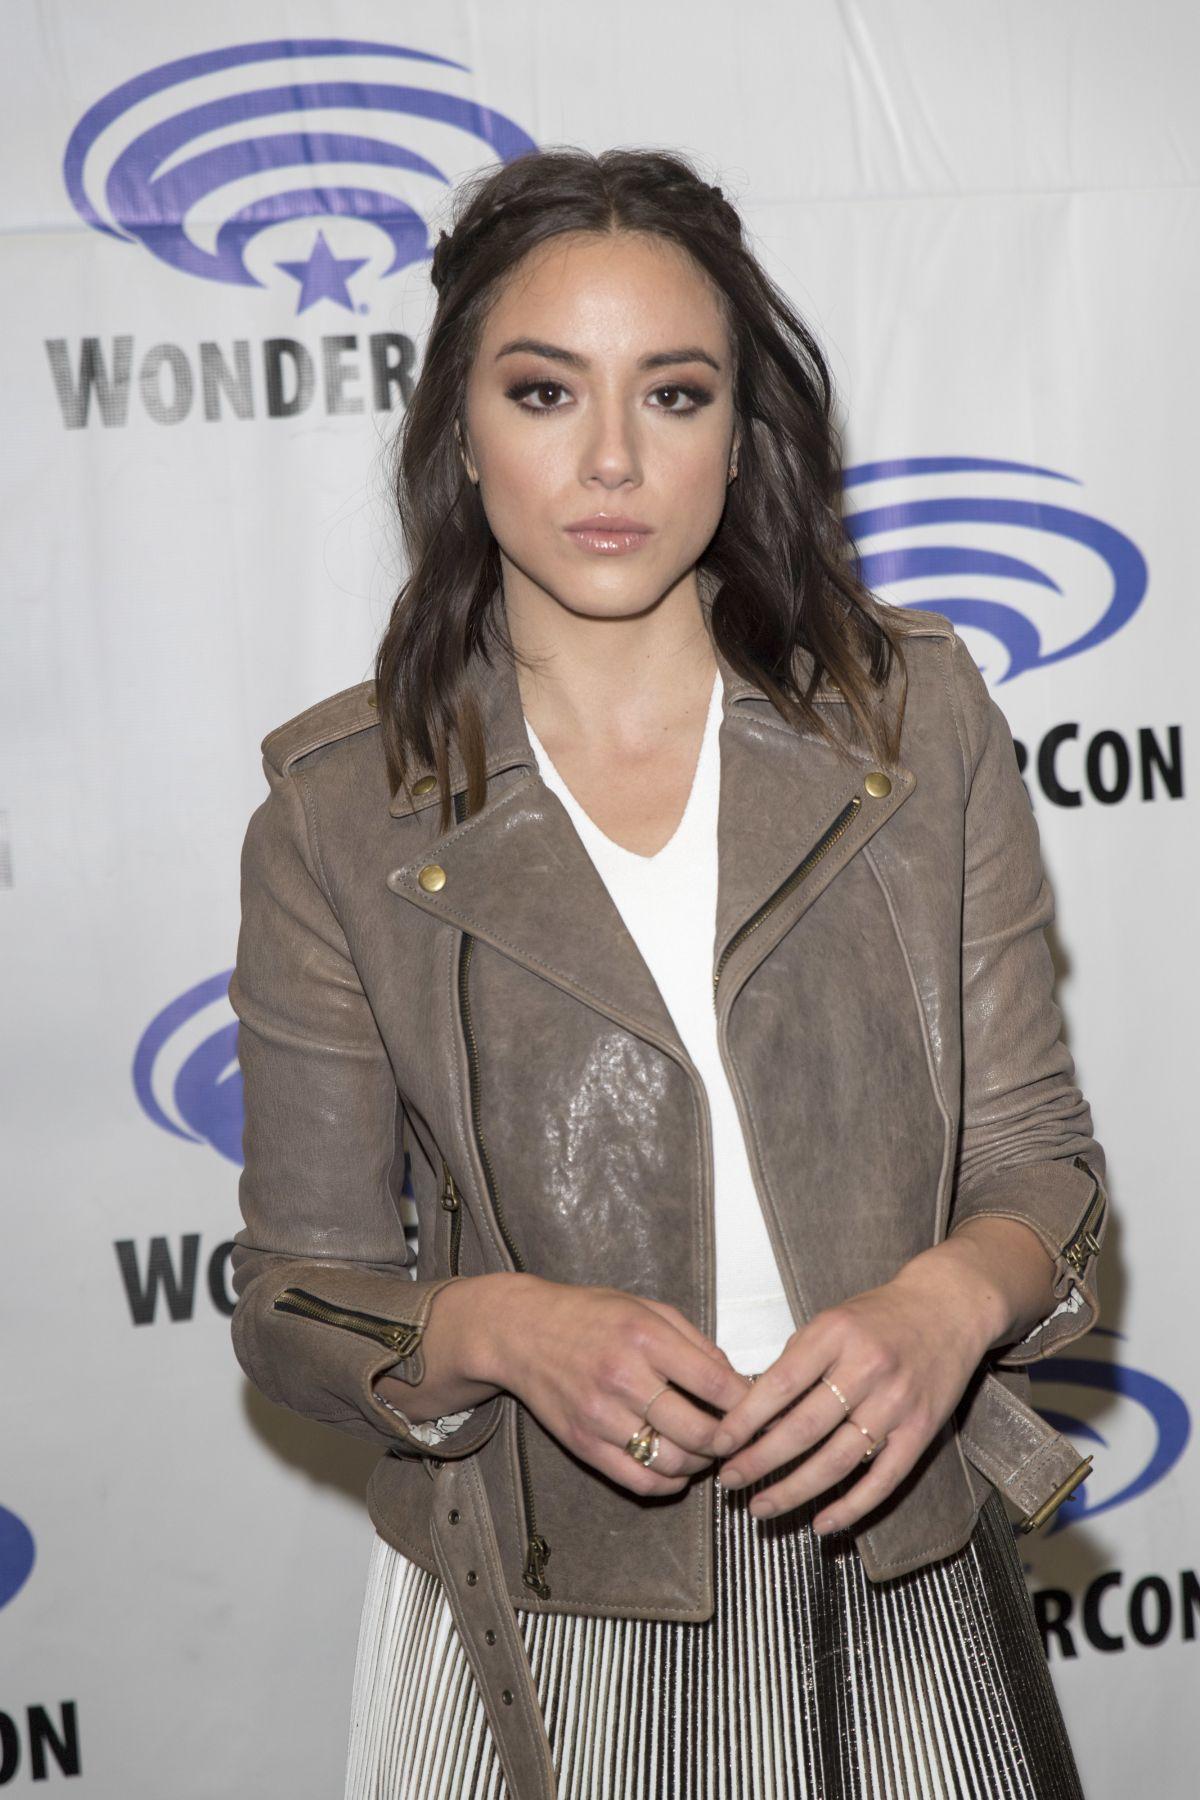 CHLOE BENNET at Agents of S.H.I.E.L.D. Press Room at WonderCom in Anaheim 04/01/2017